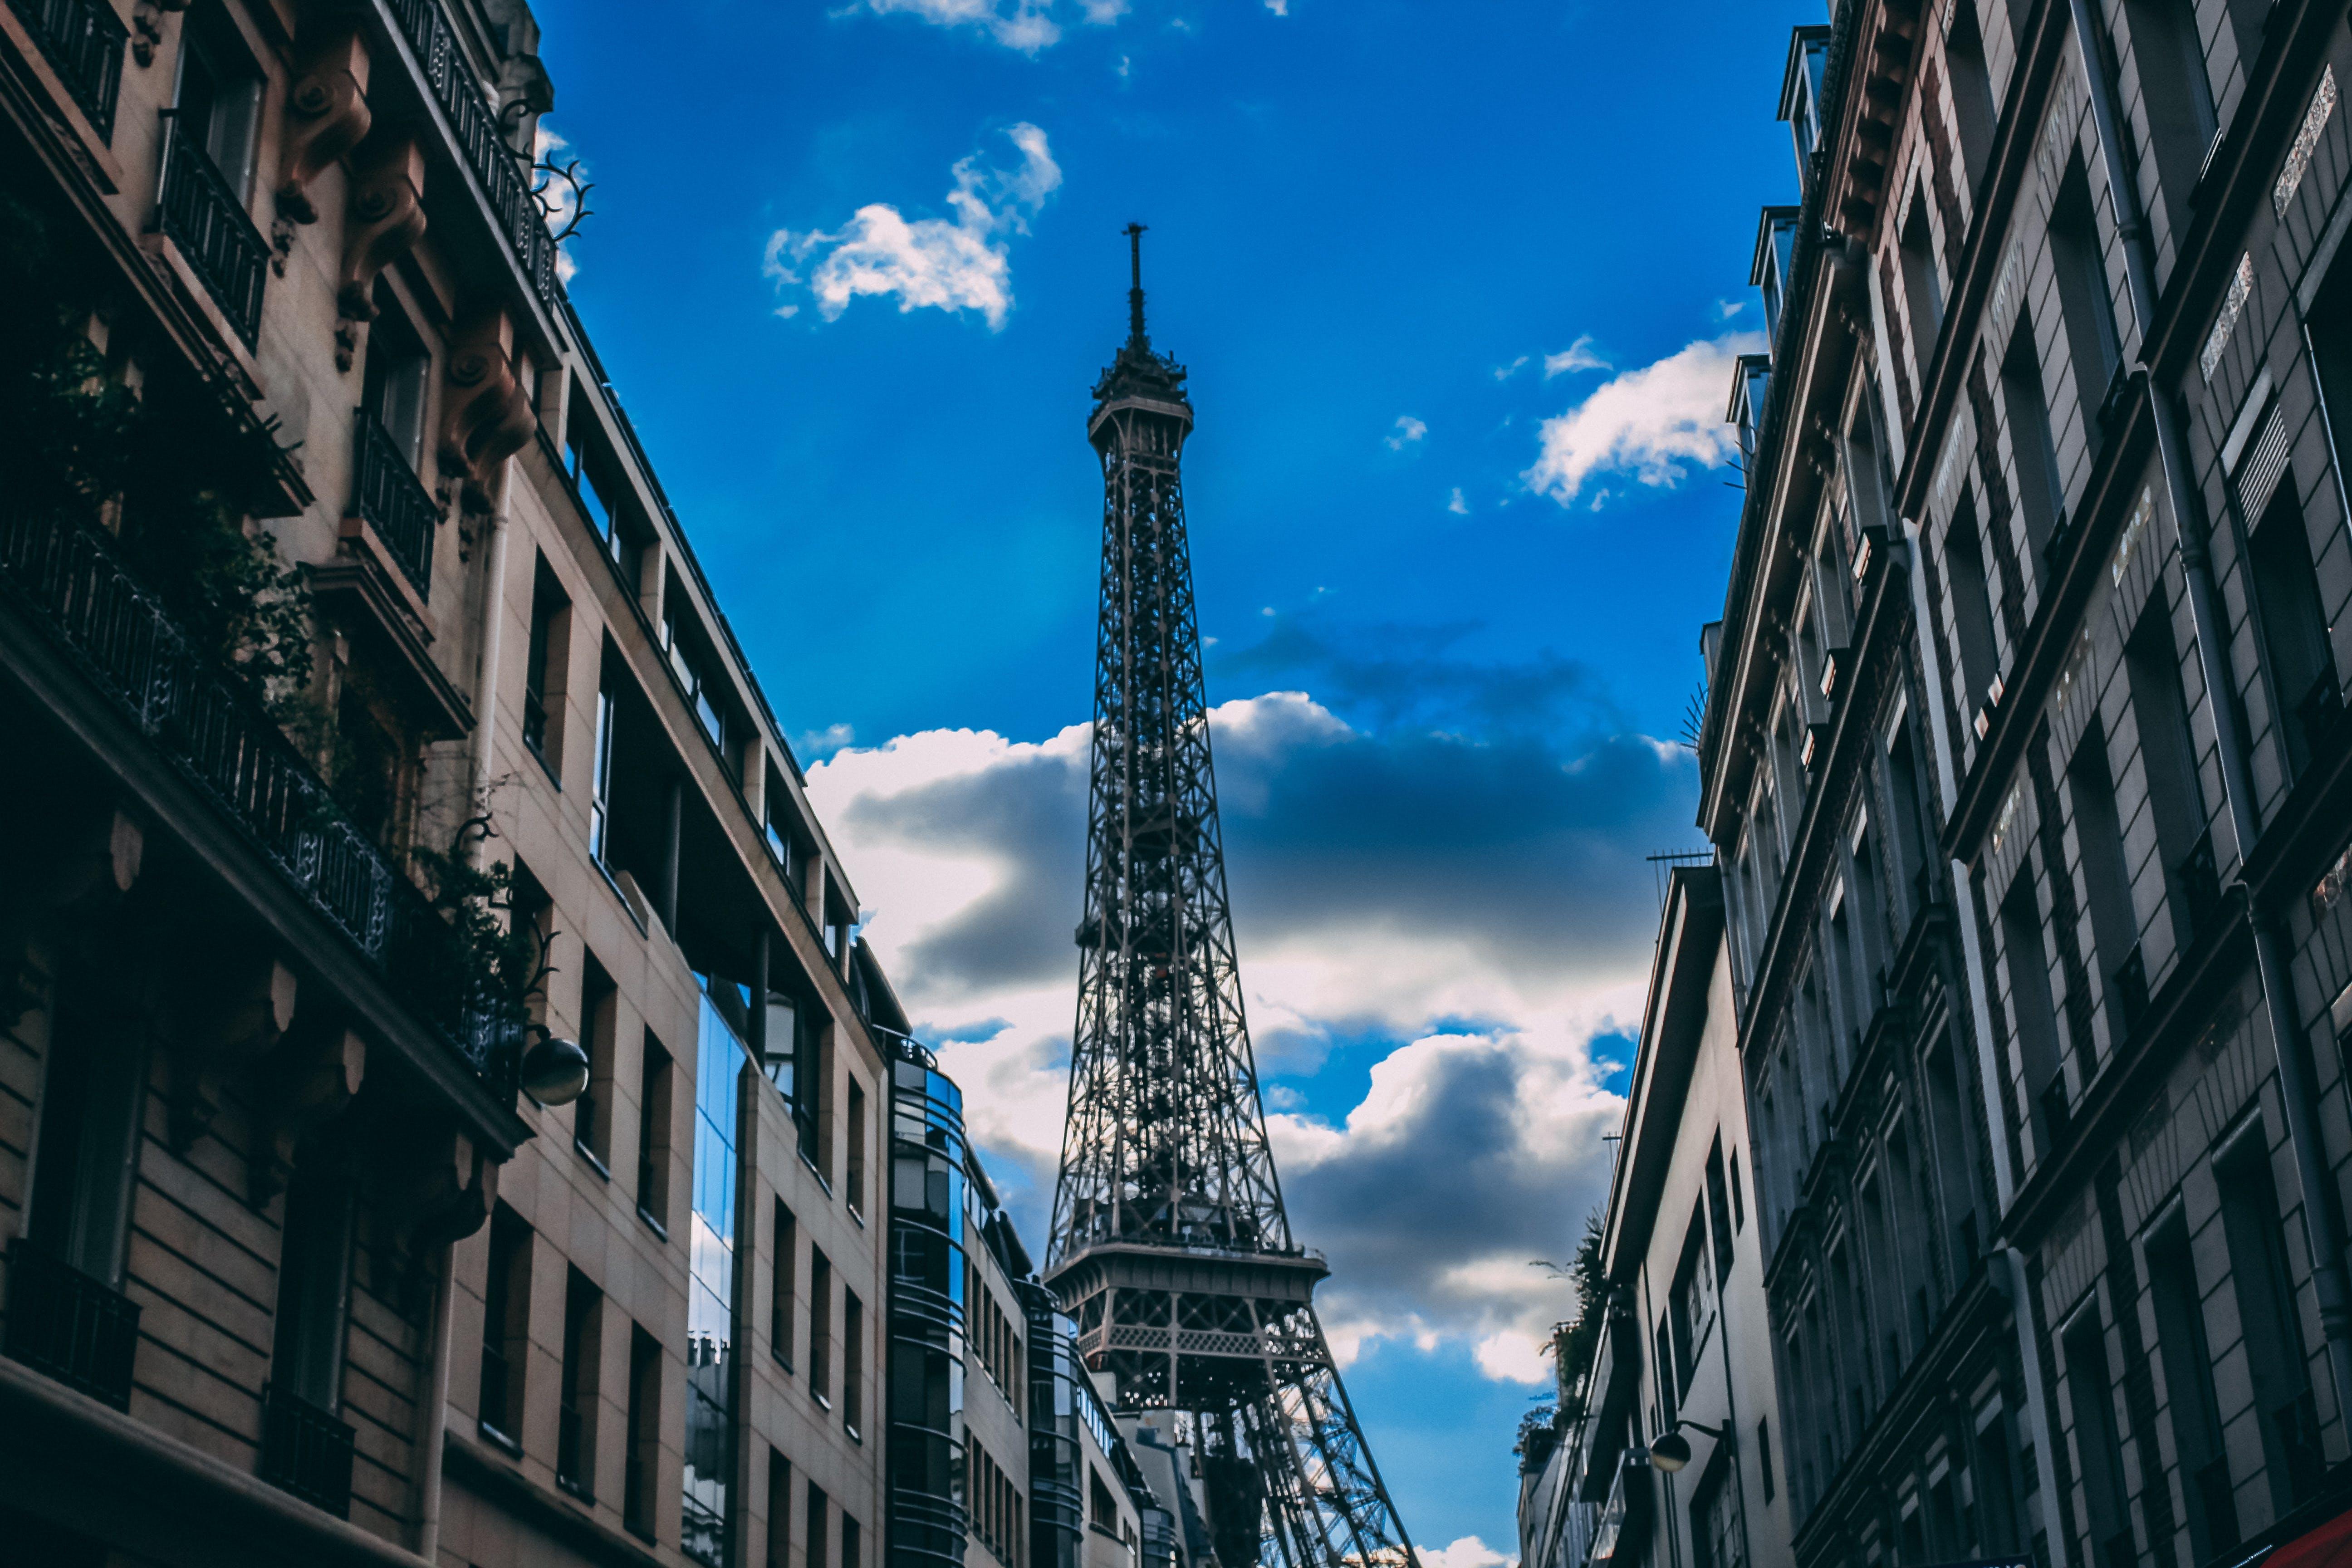 Gratis lagerfoto af Eiffeltårnet, paris